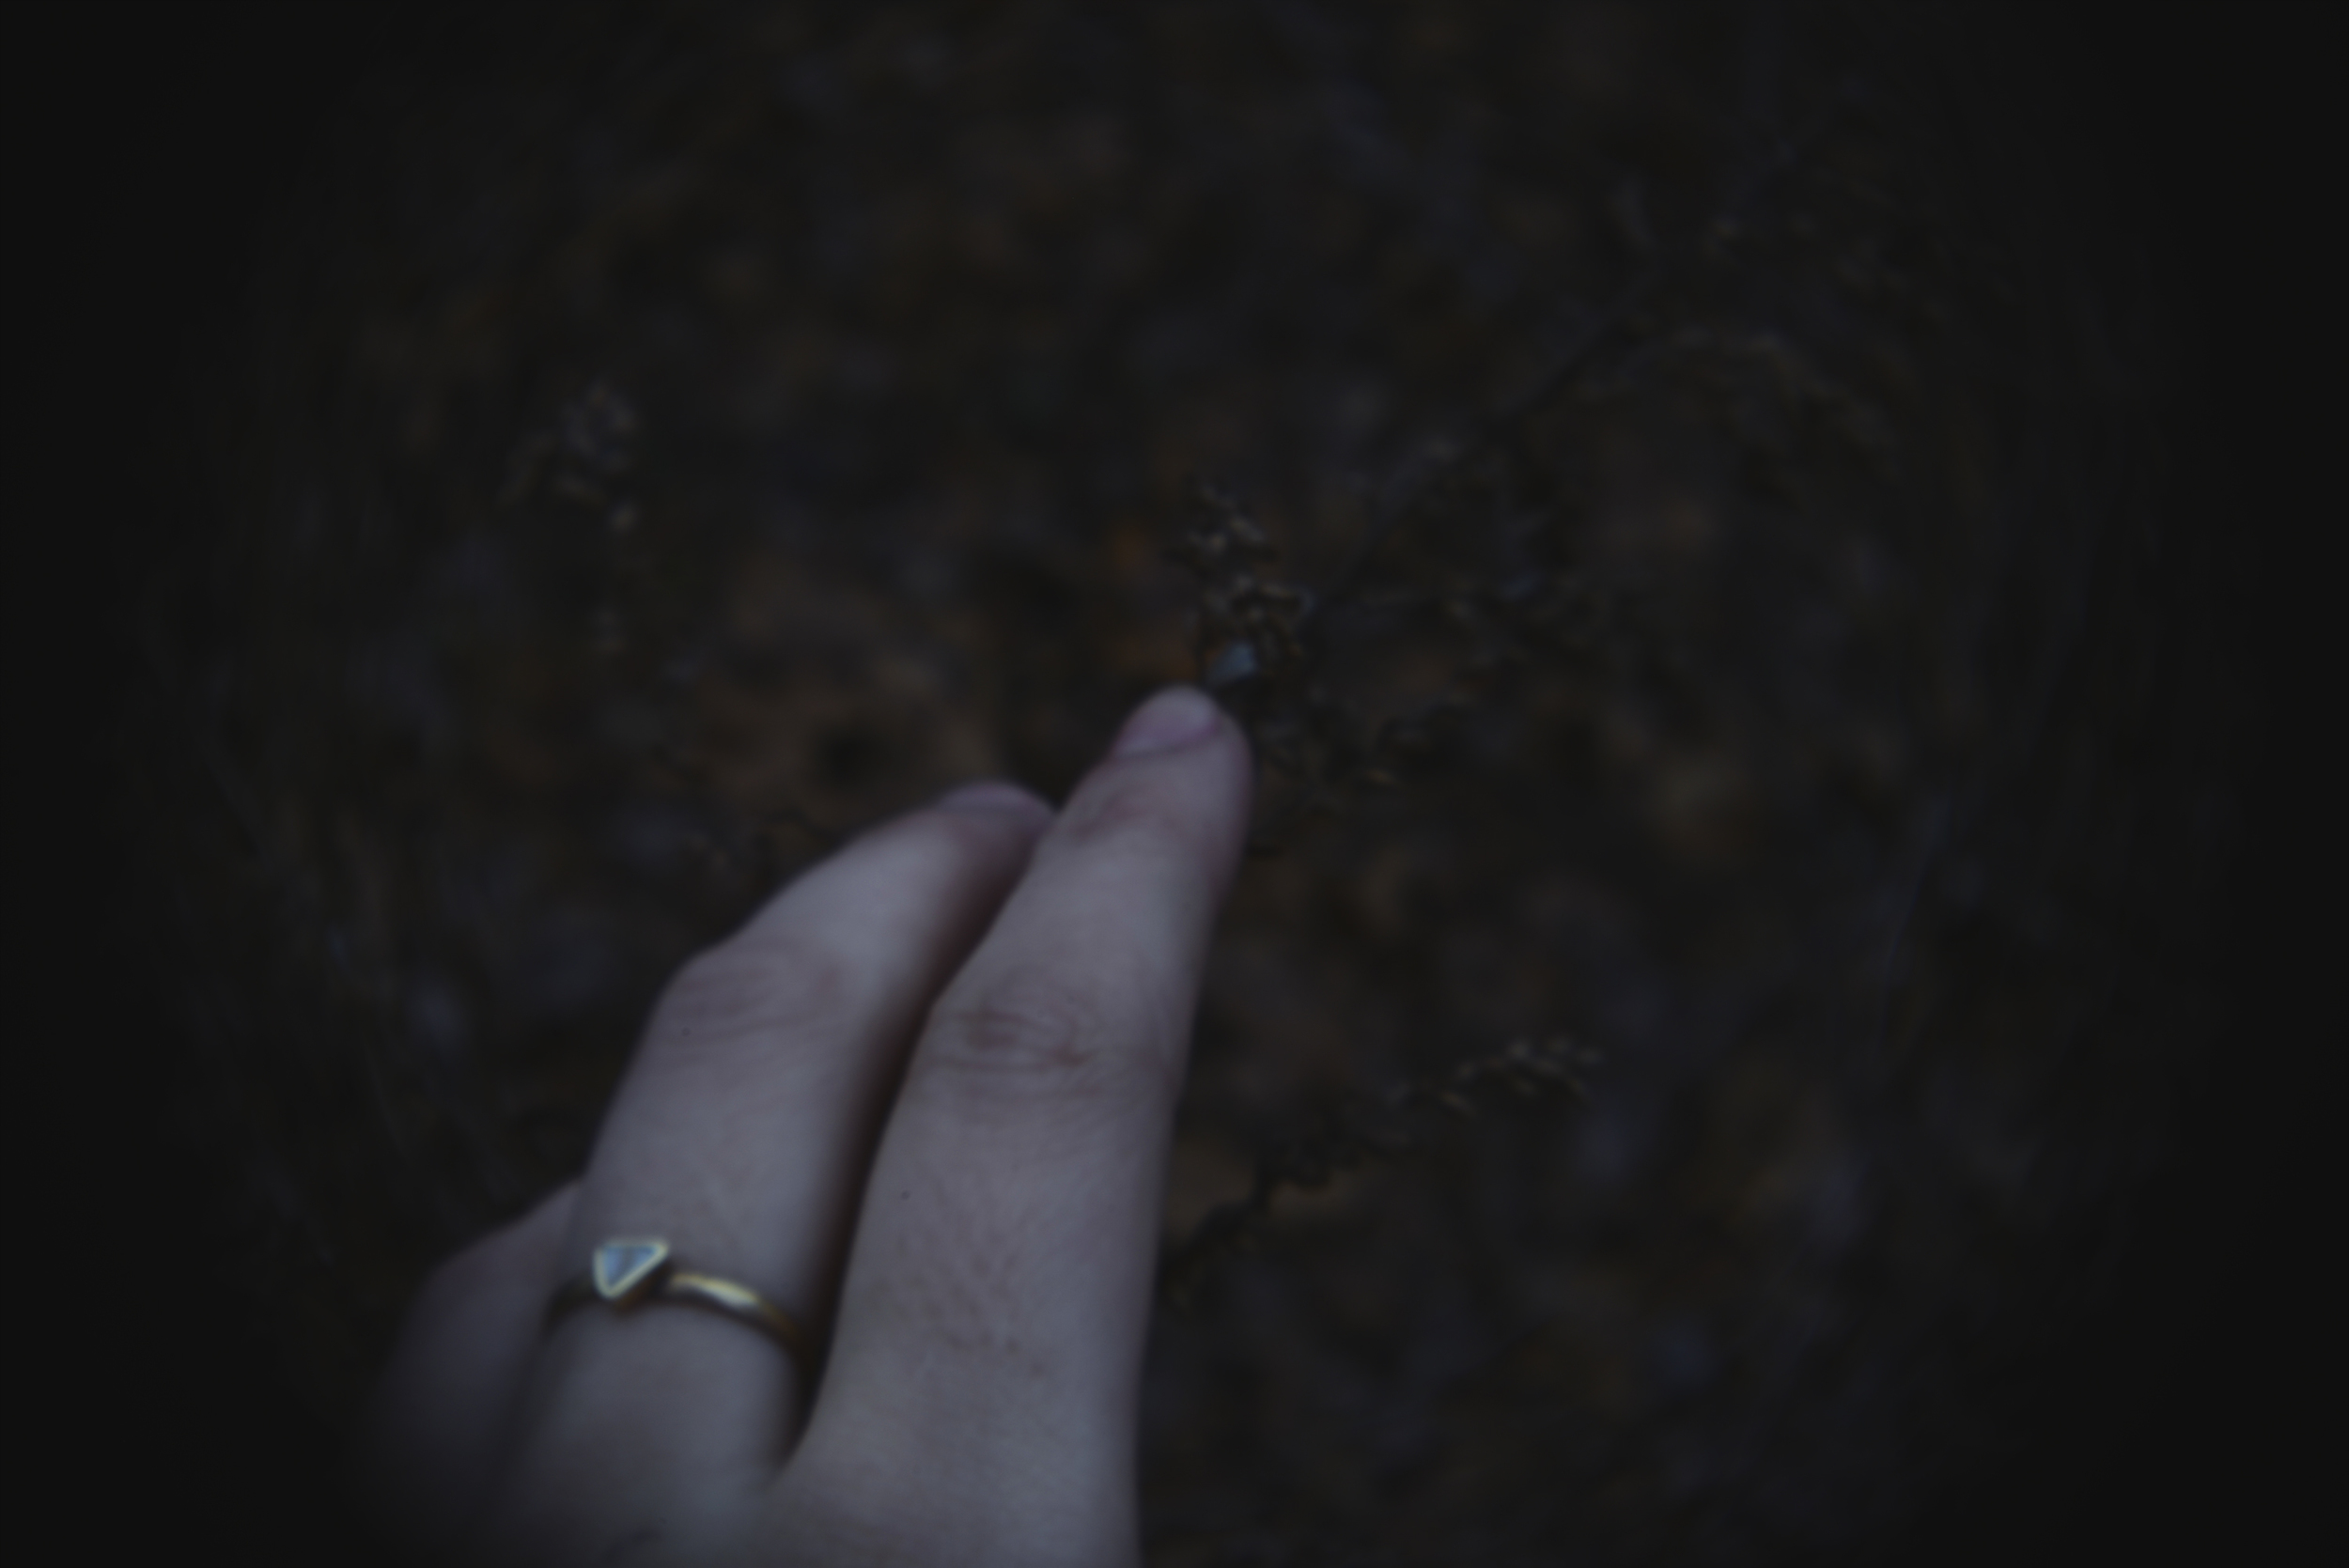 glen echo holga lens ring3.jpg